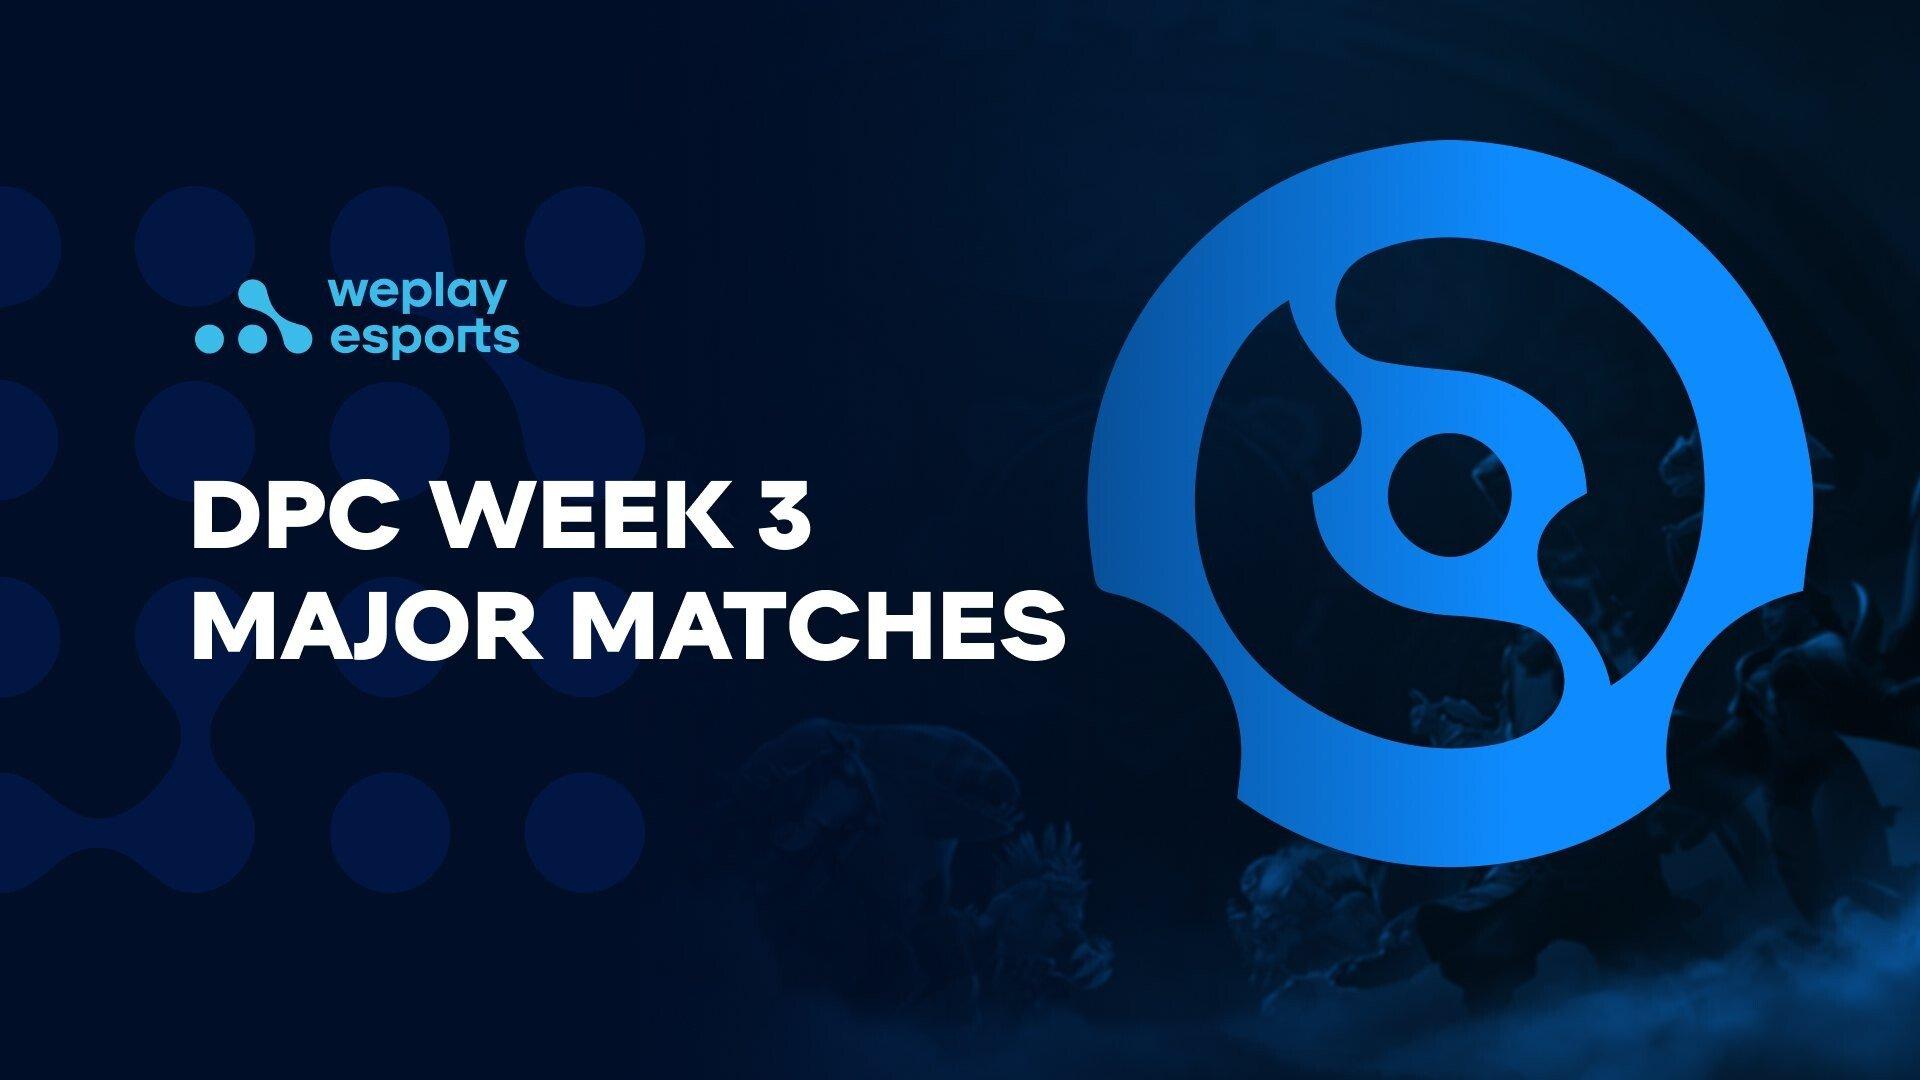 Five DPC Week 3 Major Matches